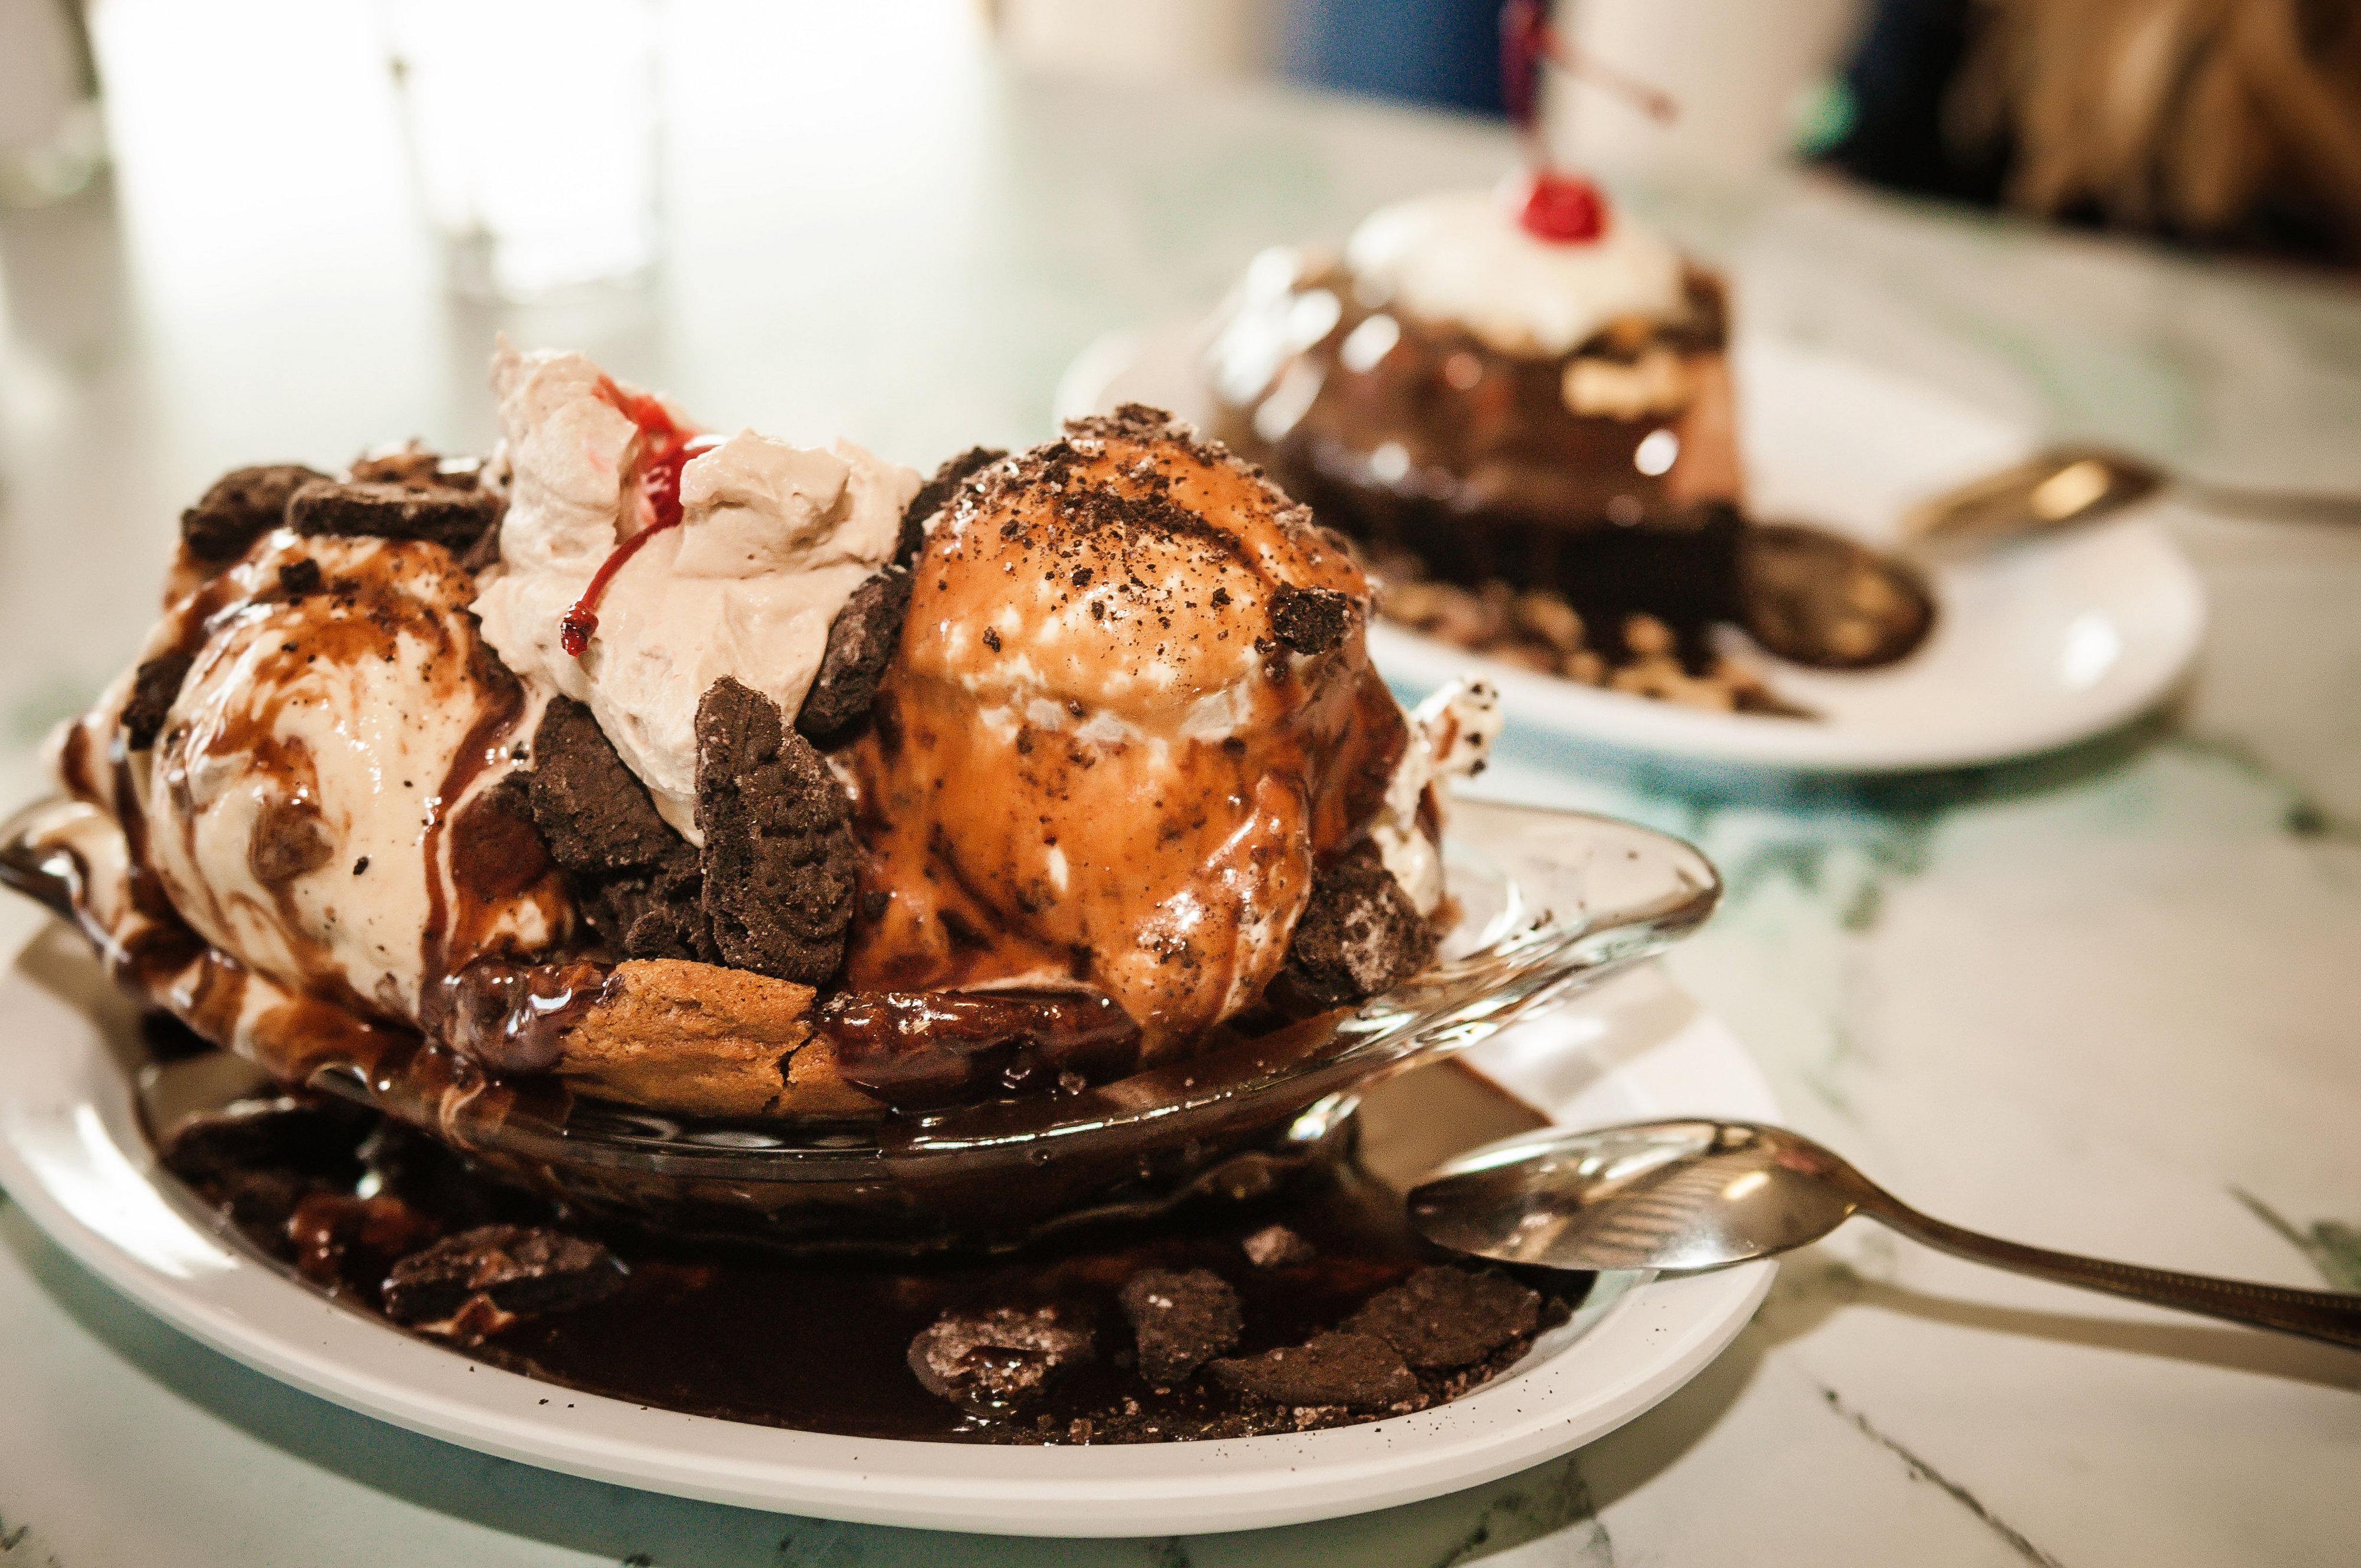 Leatherby's Family Creamery – Ice Cream Sunday's